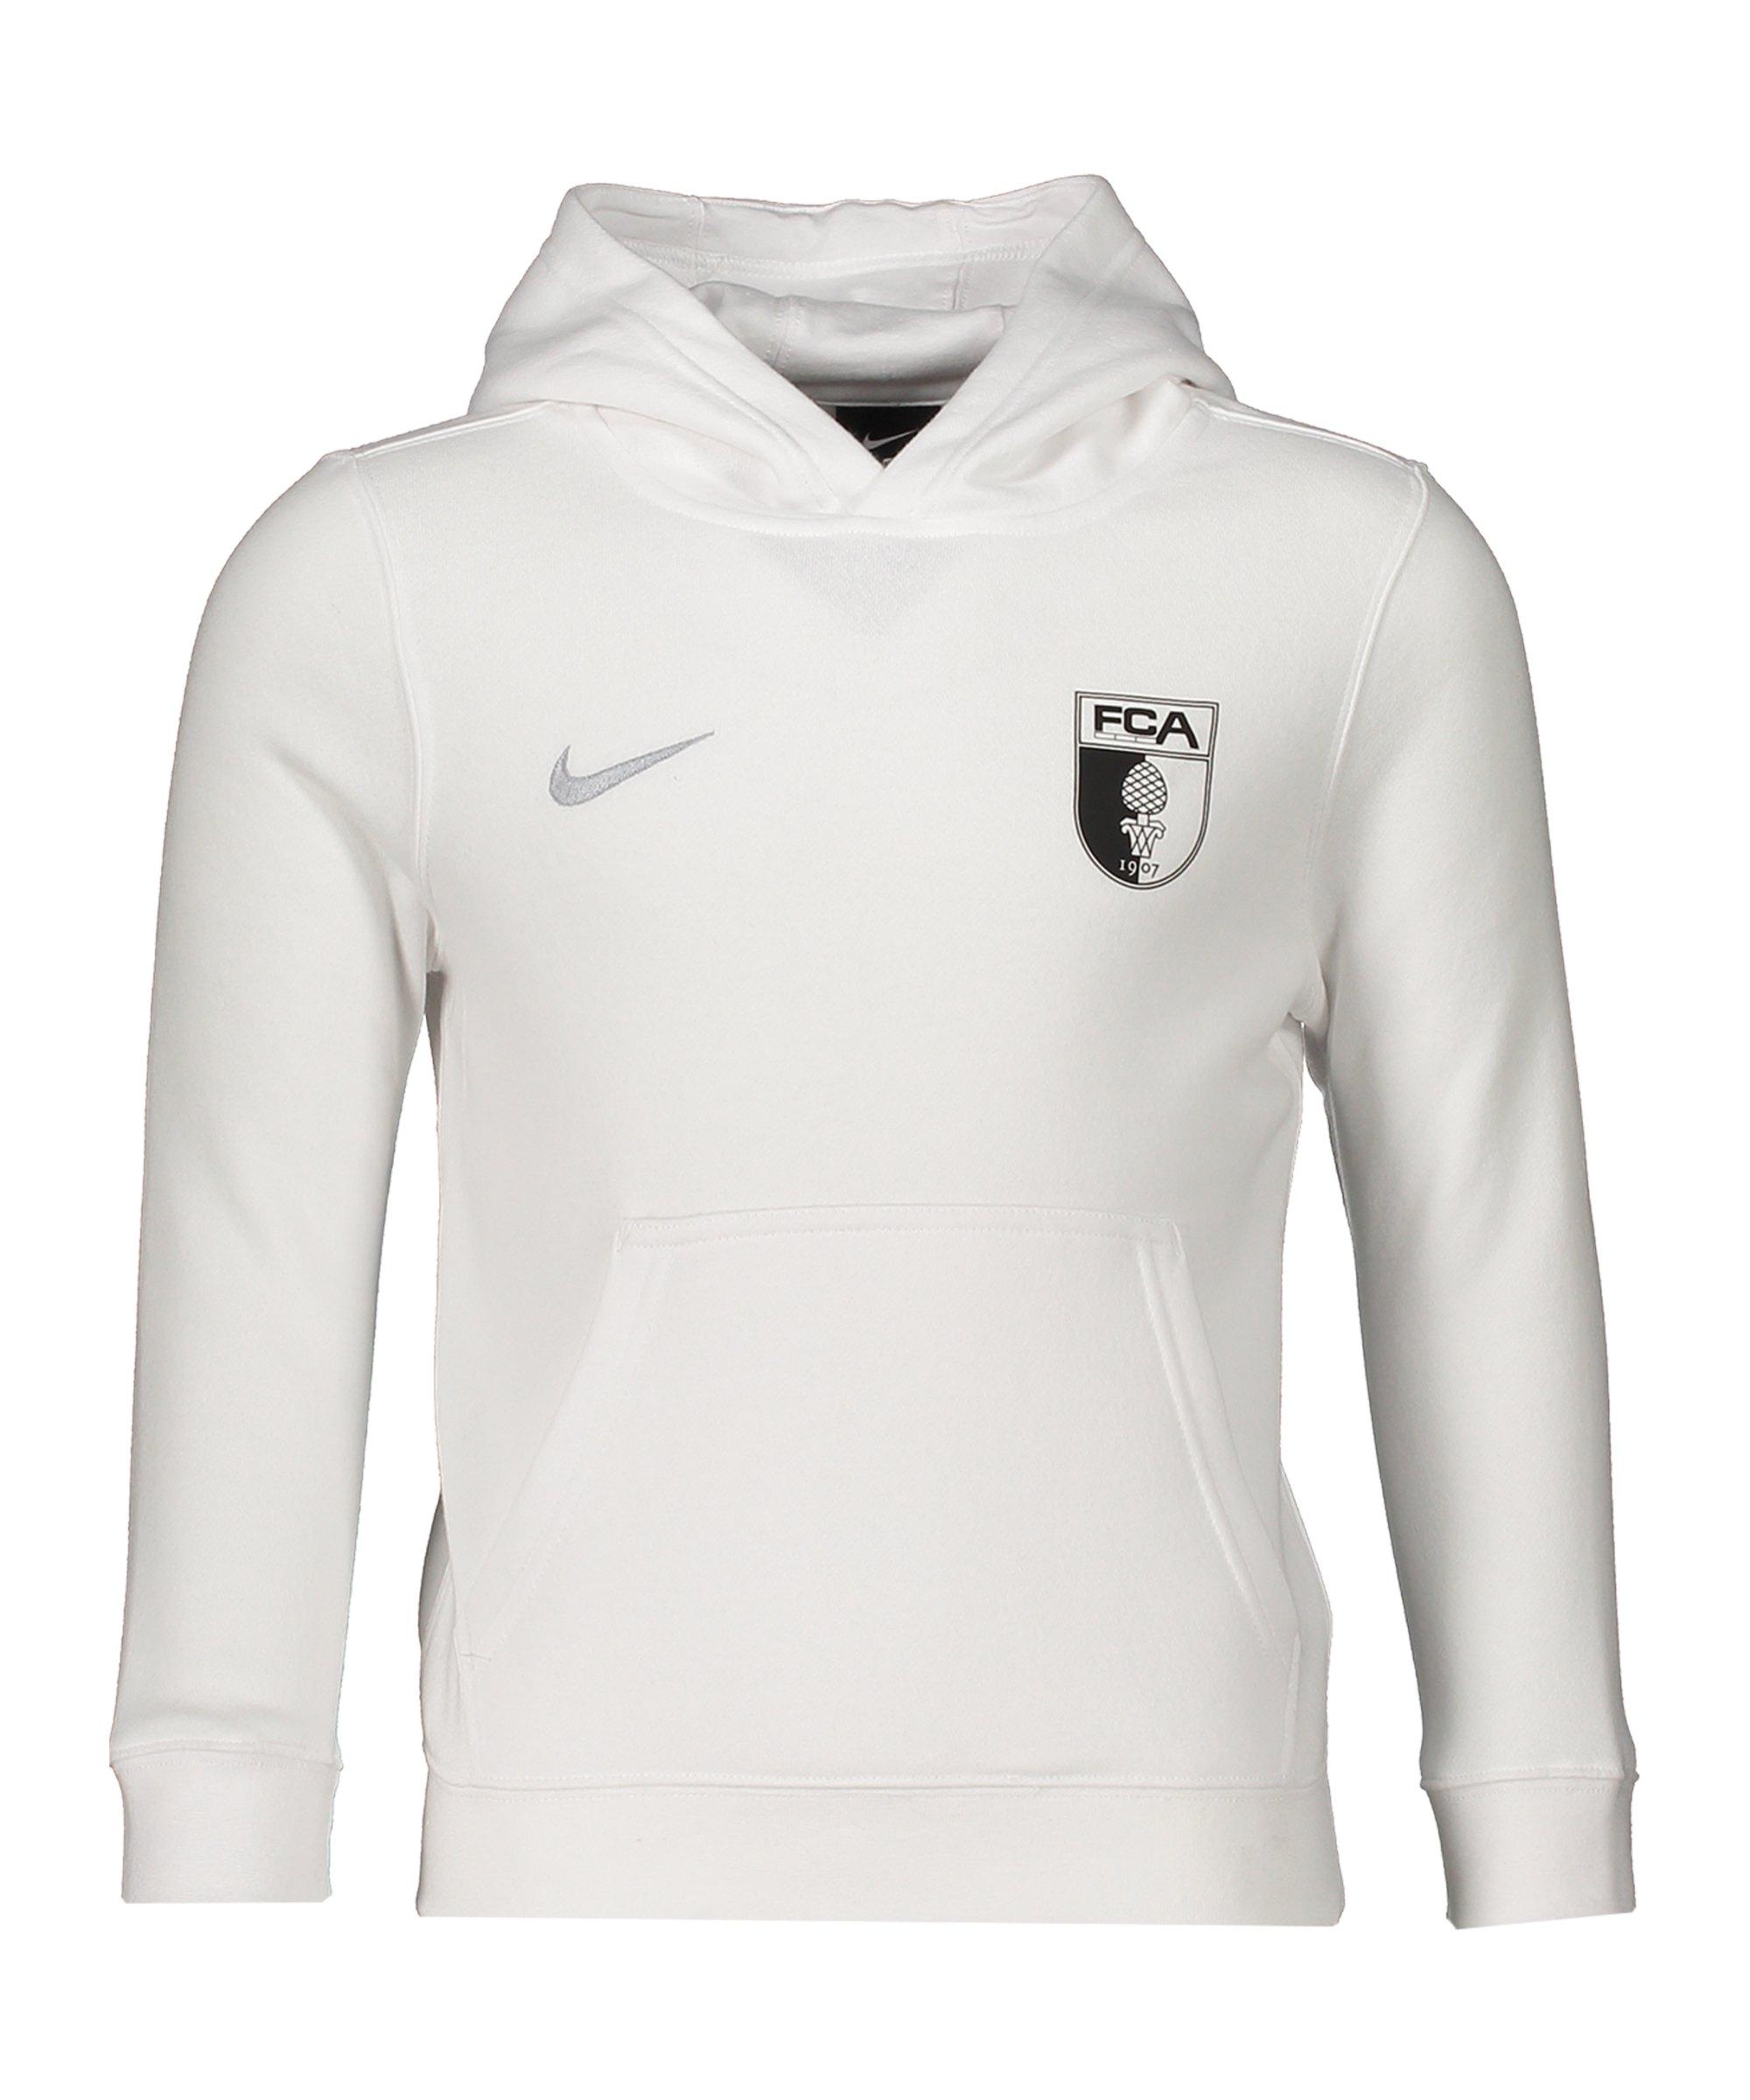 Nike FC Augsburg Kapuzenpullover Kids Weiss F100 - weiss